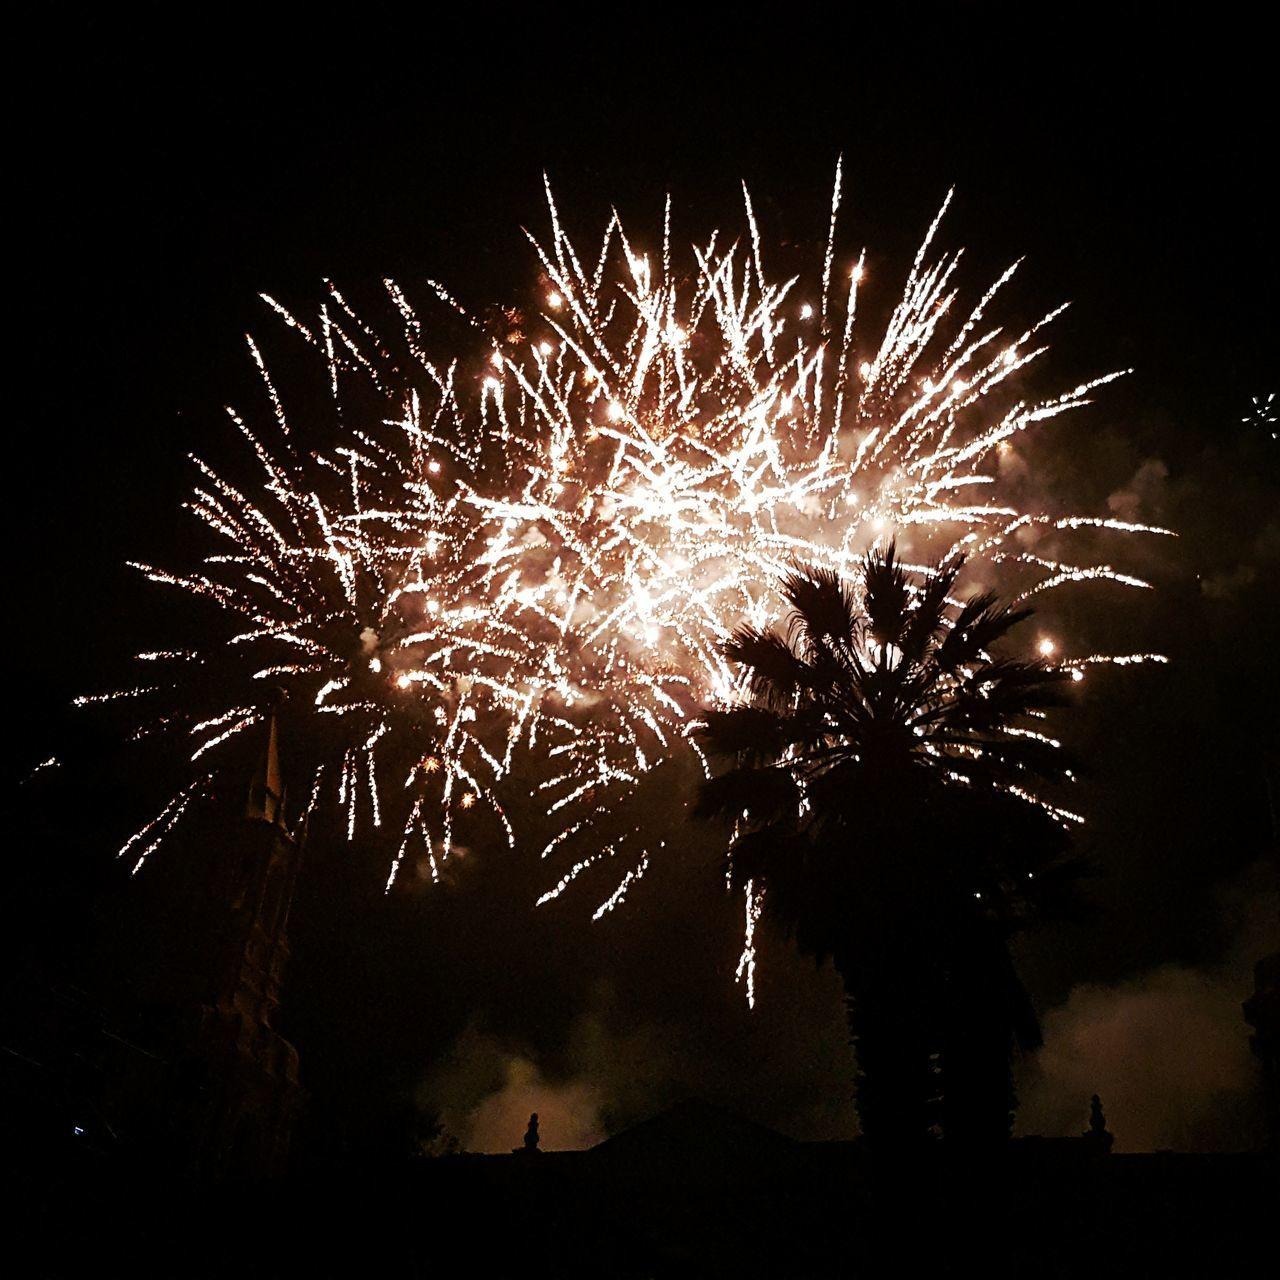 Celebration Night Low Angle View Sparks Majestic Motion Justfeelit Sky Glowing Dark